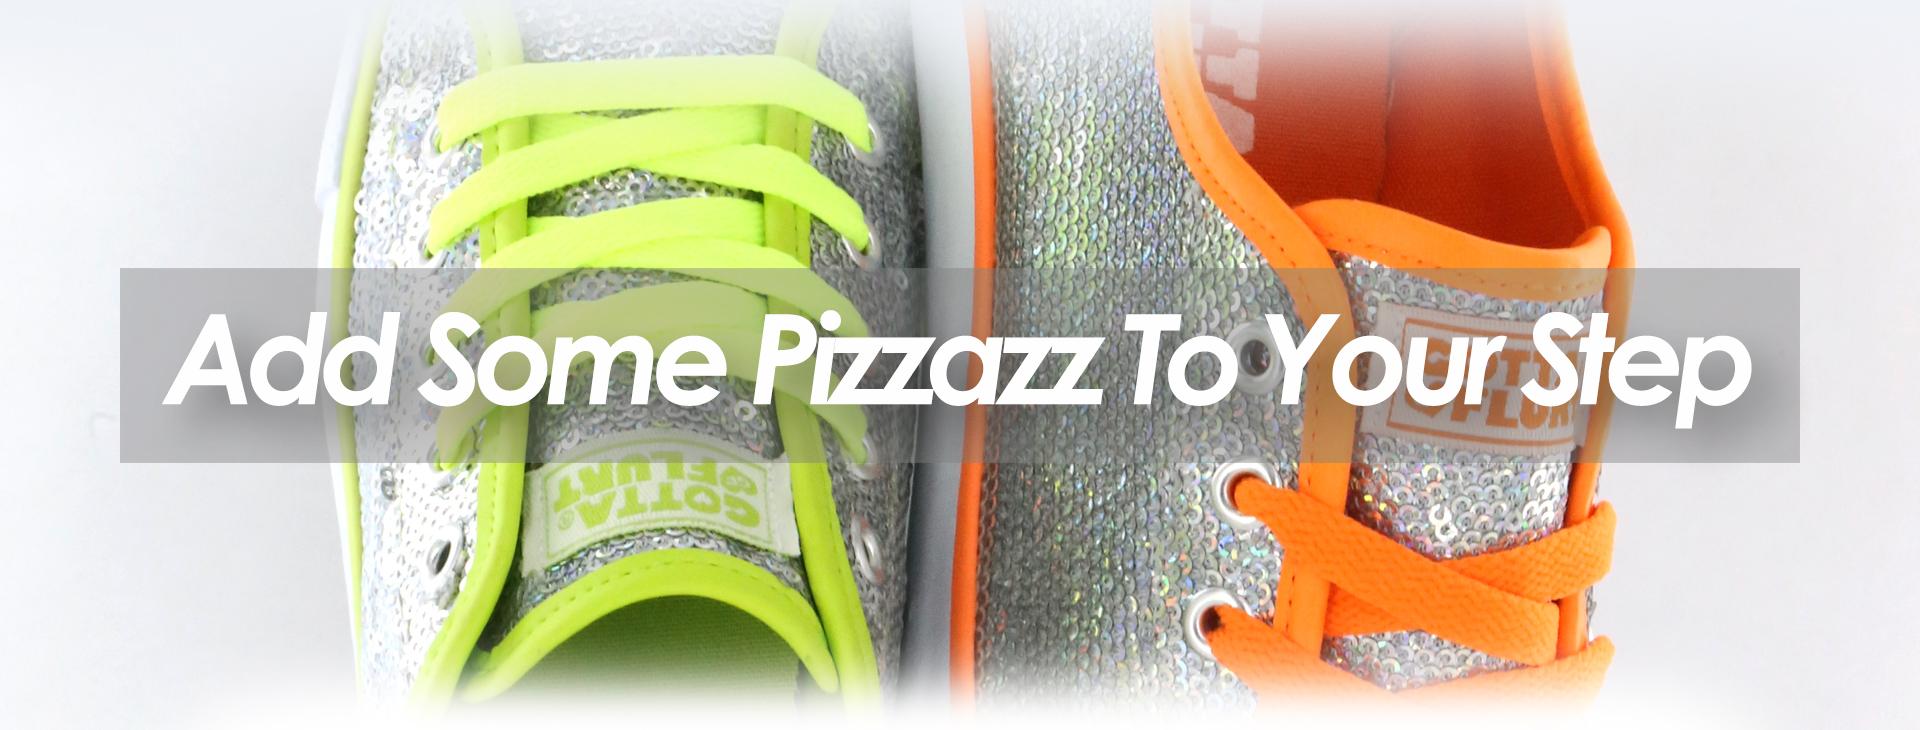 PIZZAZZ WEB BANNER